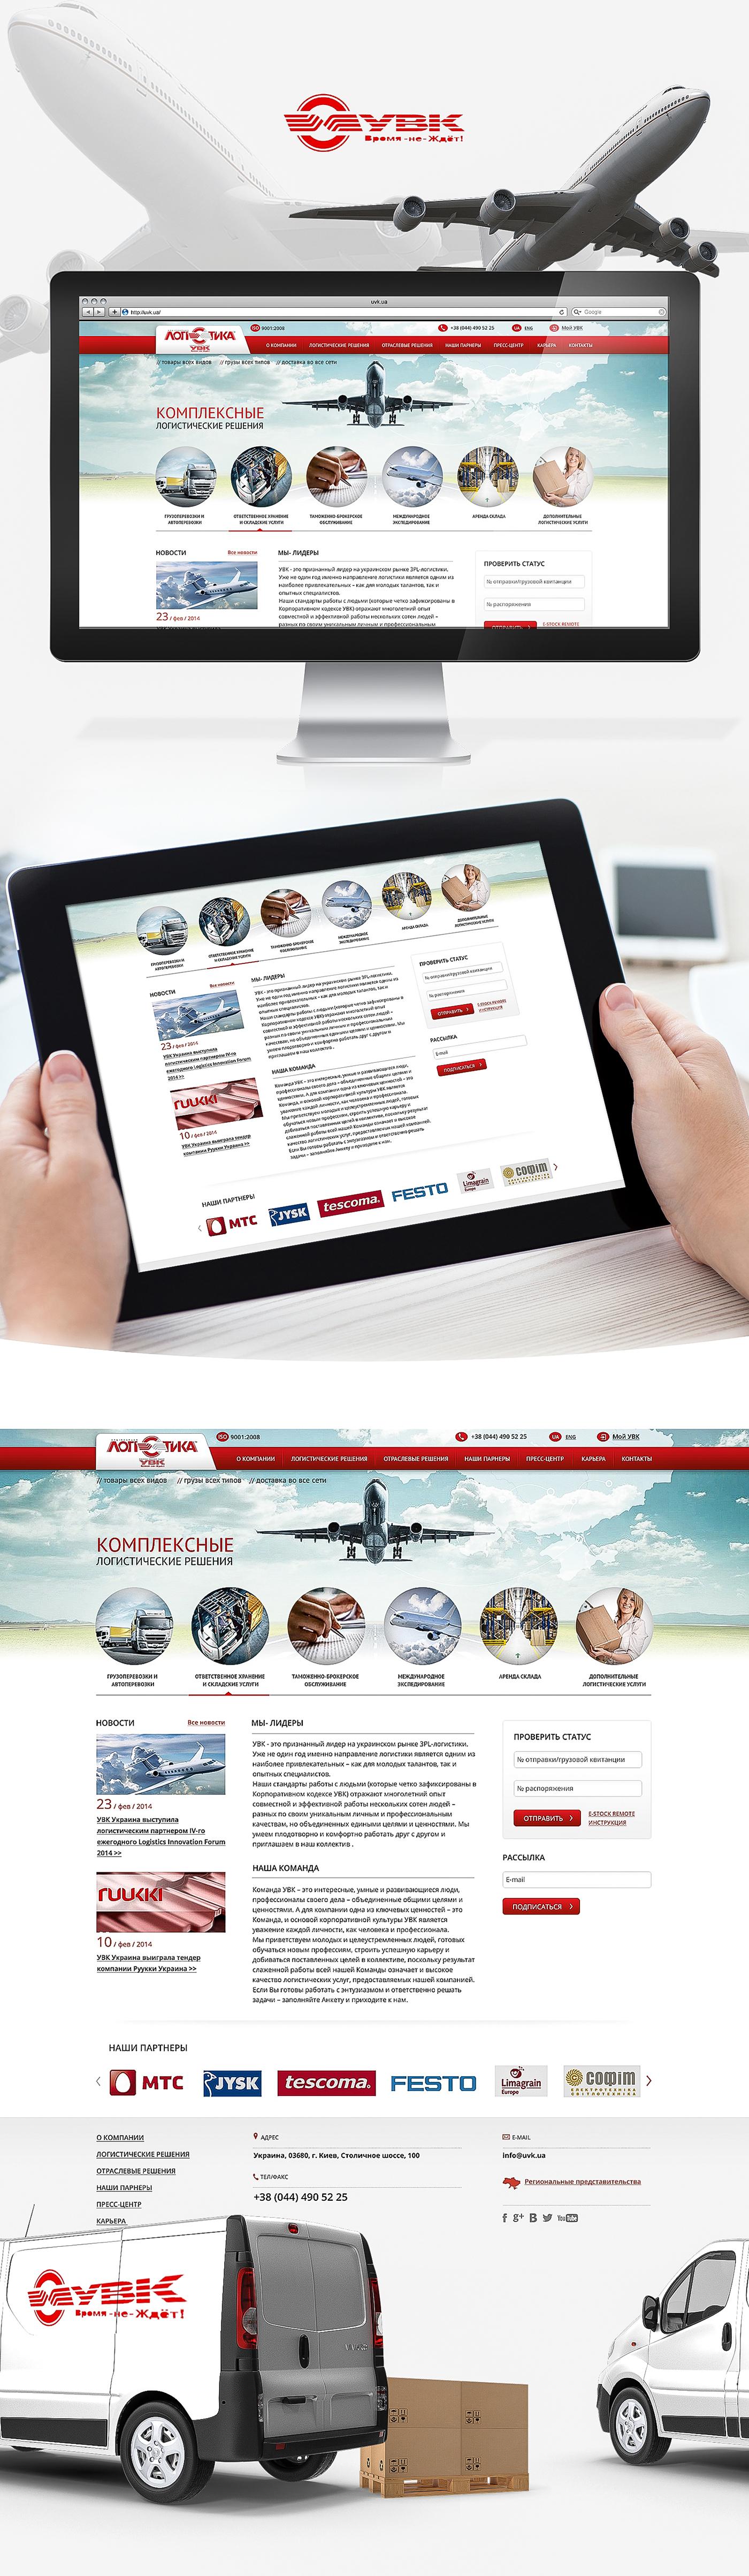 YBK Website Web Design